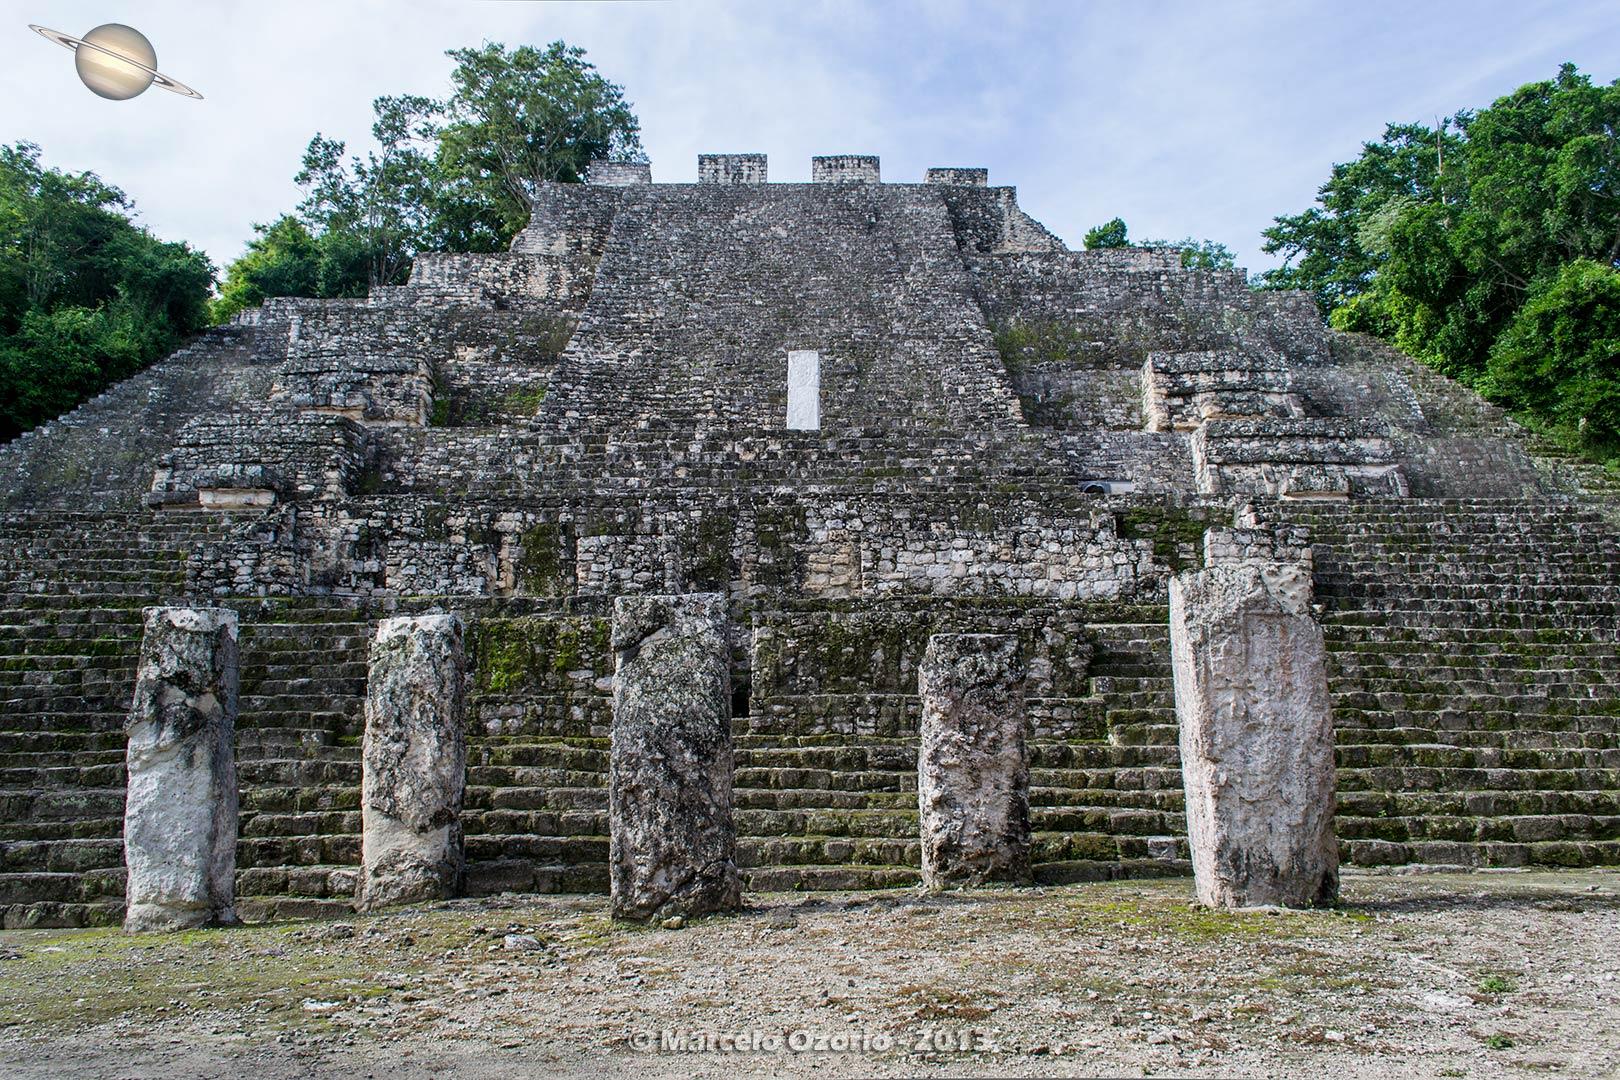 calakmul mayan civilization mexico 4 - Calakmul, City of the Two Adjacent Pyramids - Mexico